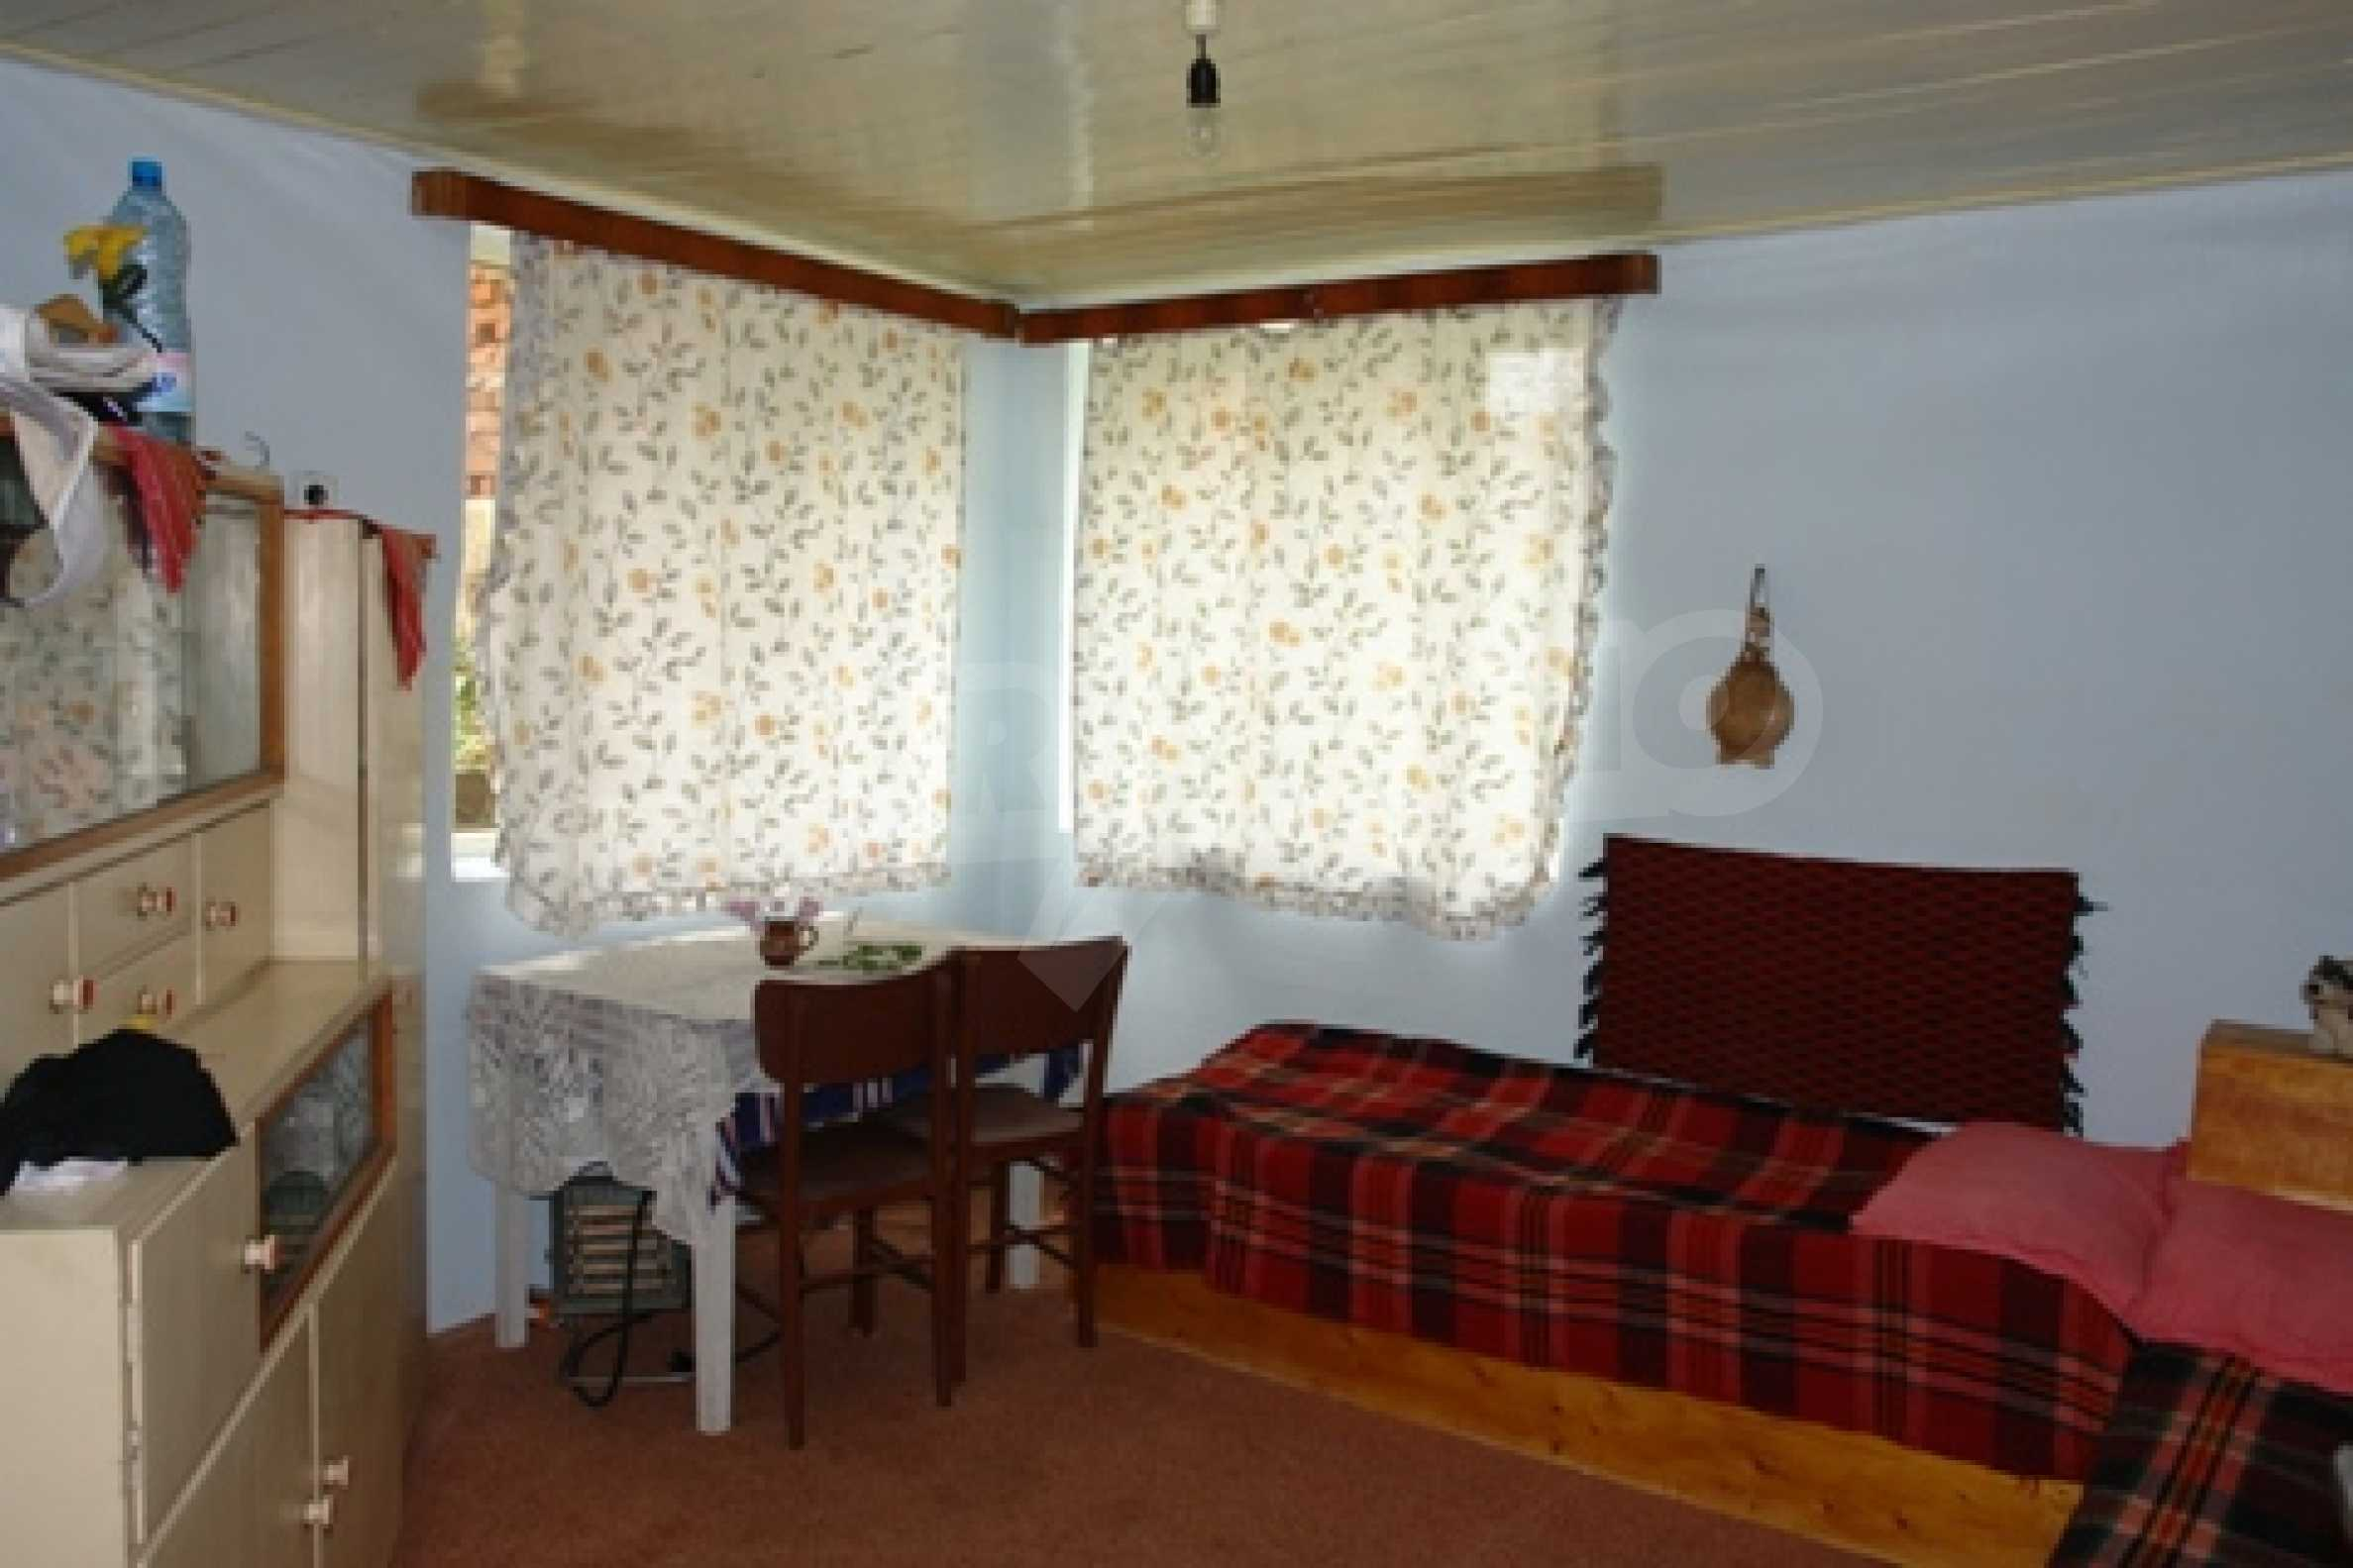 Spacious two-storey 4-bedroom house in Trastenik village, Ruse district 4